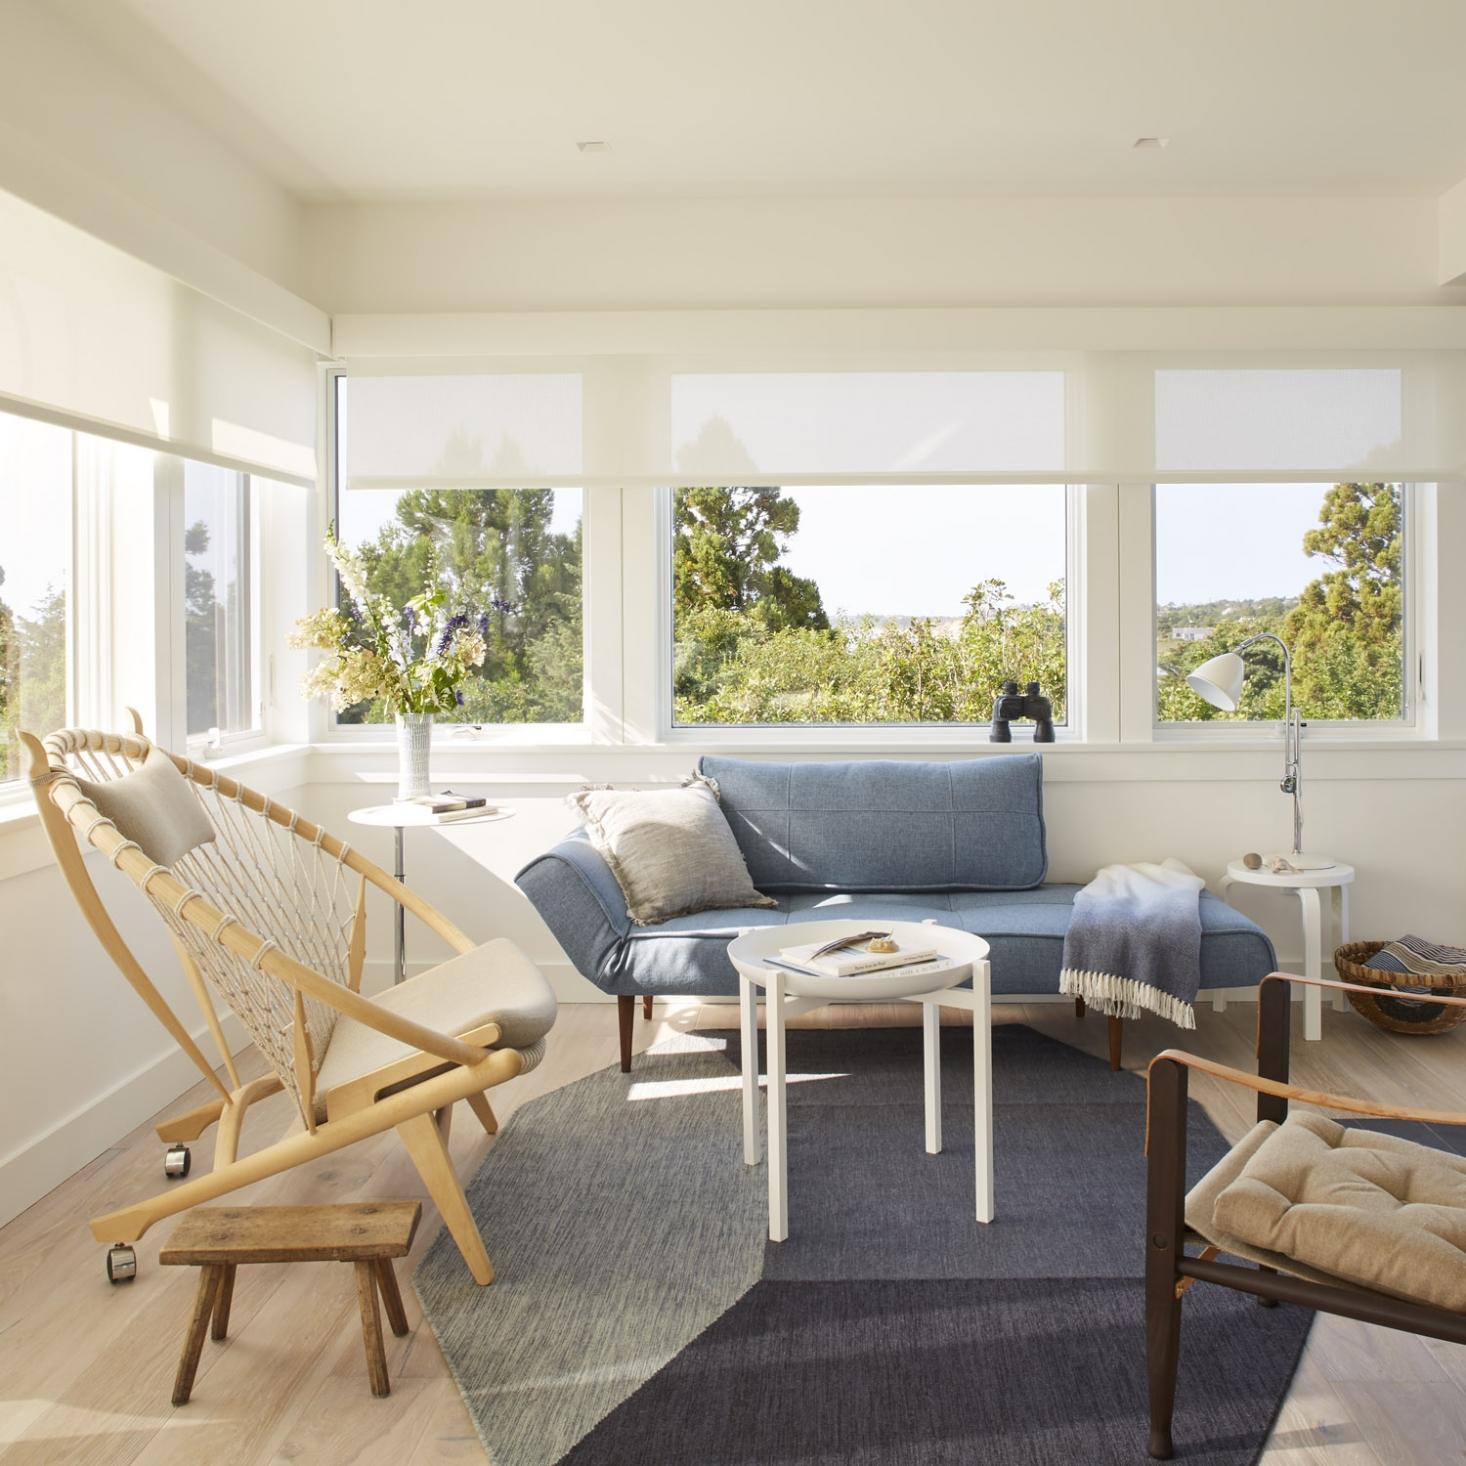 cottage-chilmark-blue-sofa-rope-lounge-chair-1466x1466.jpg